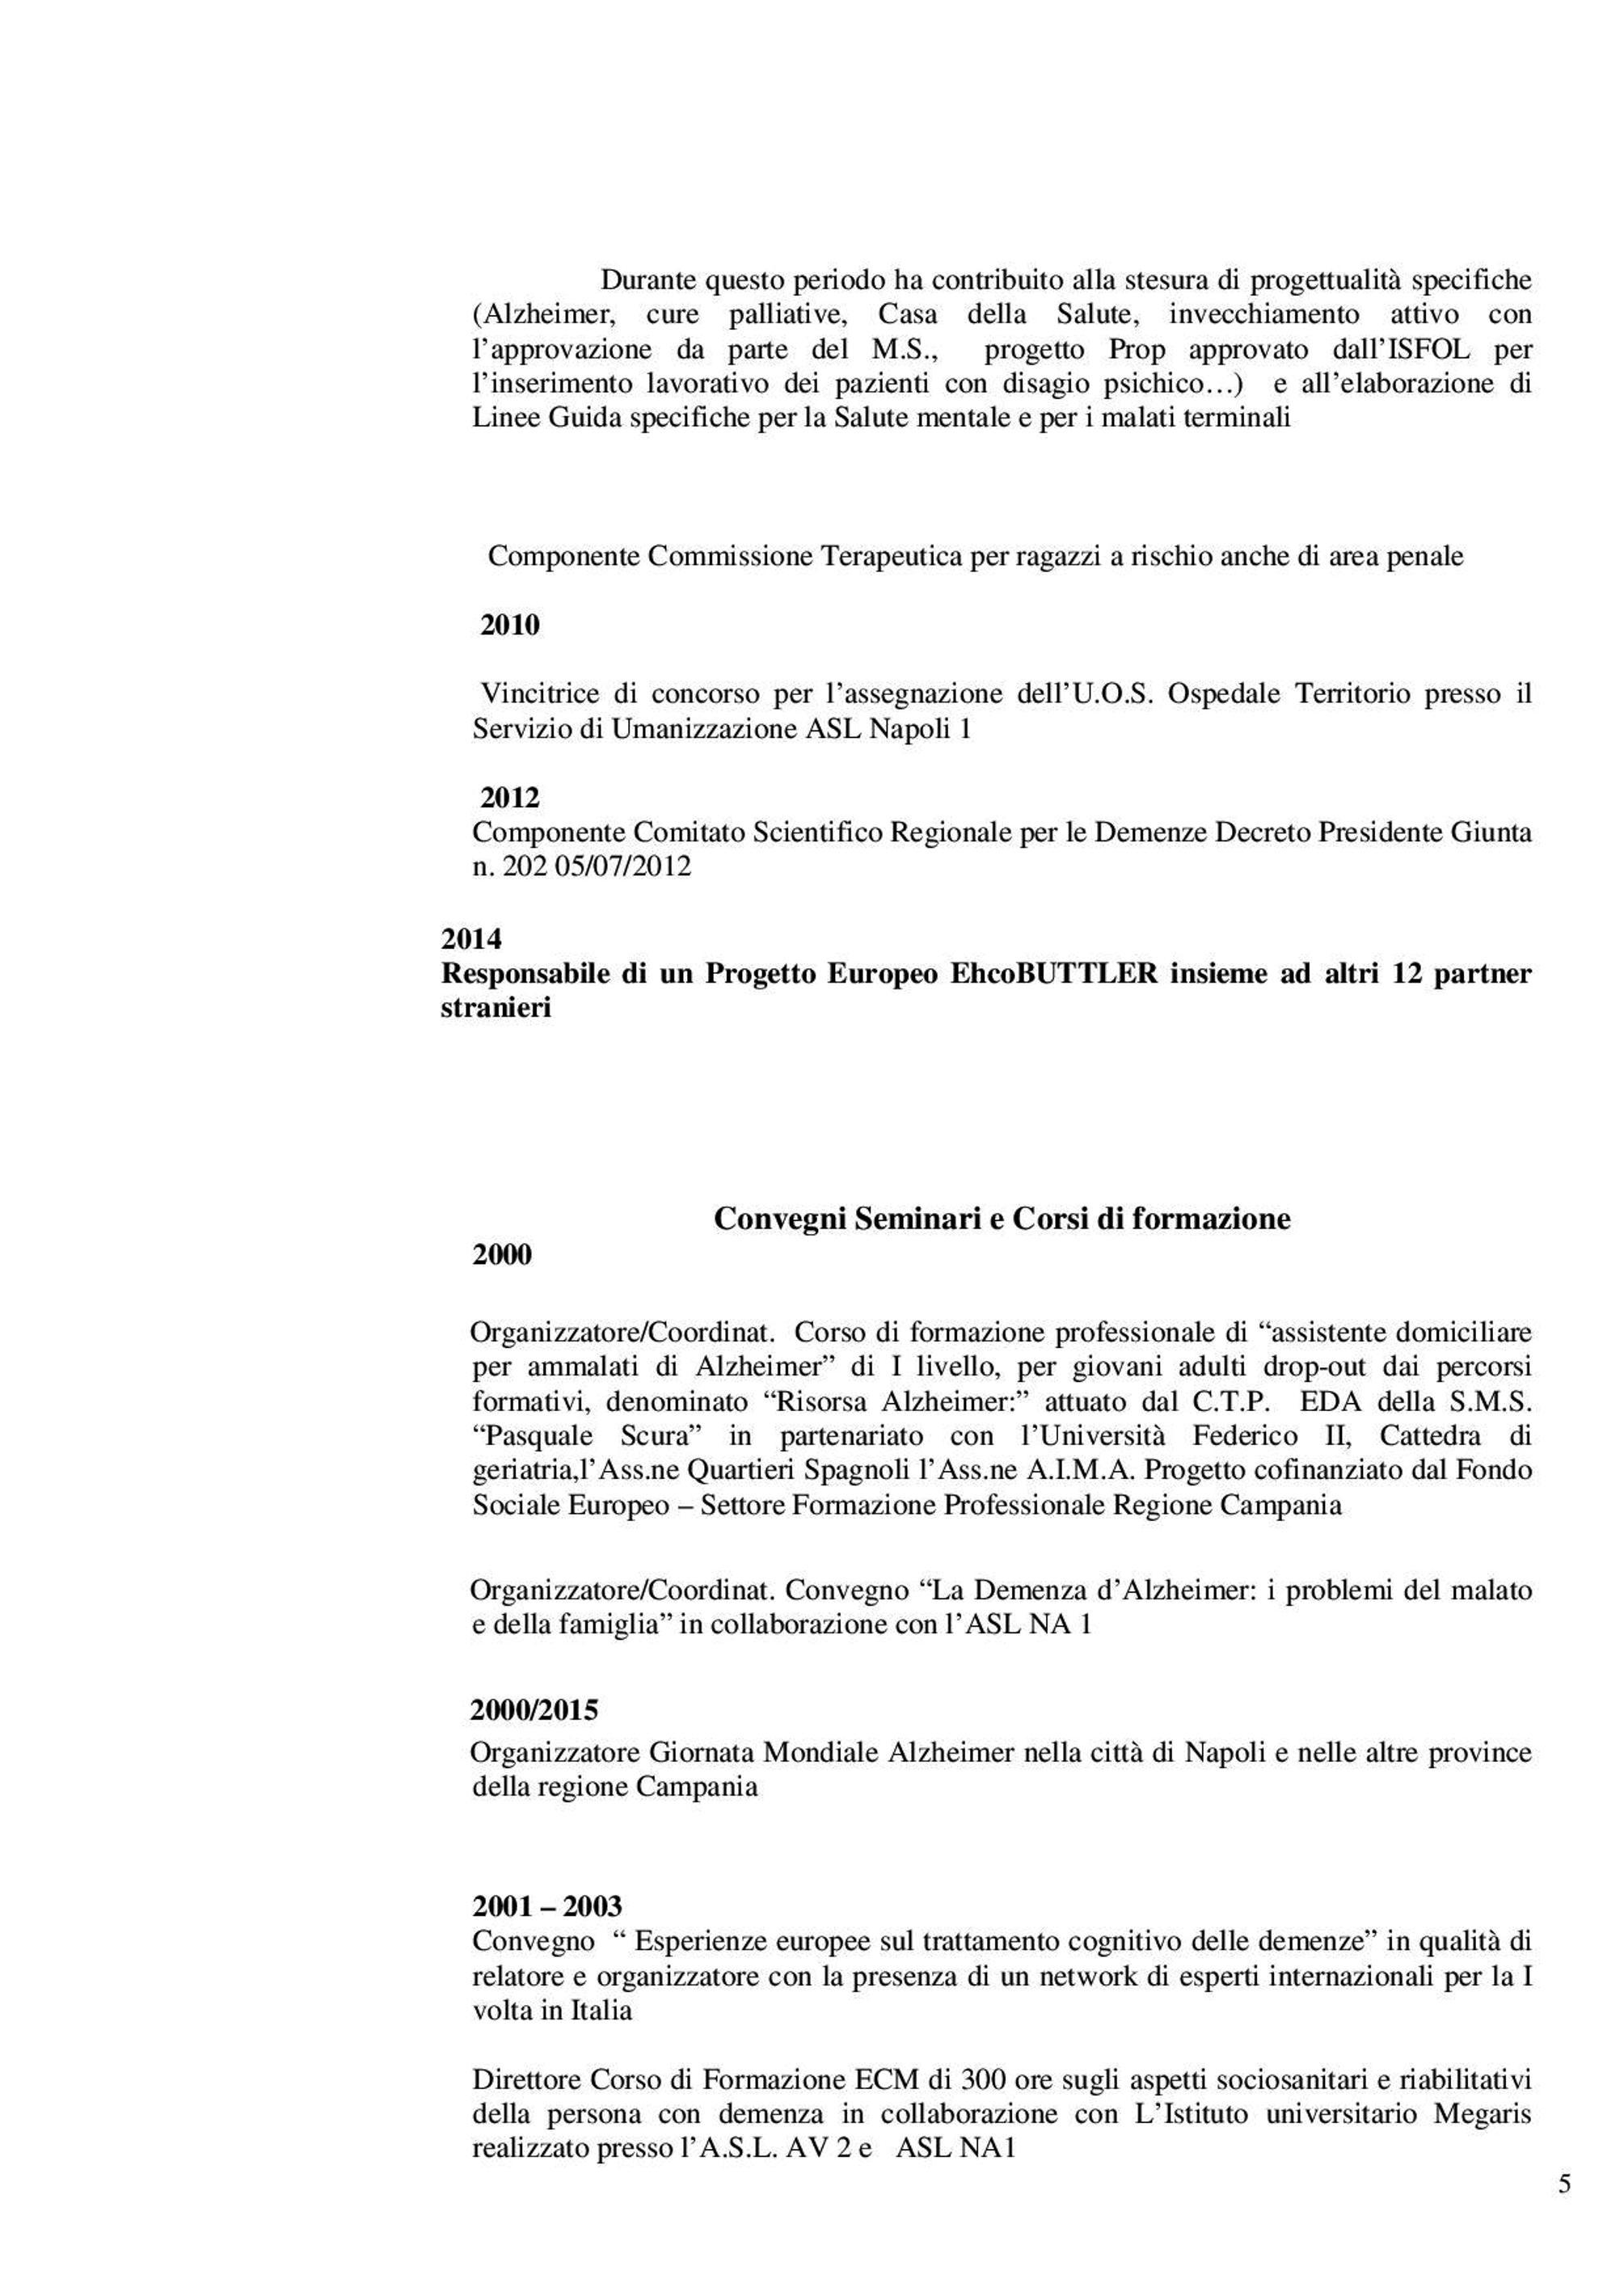 CUURICULUM MUSELLA FORMATO EUROPEO-page-005